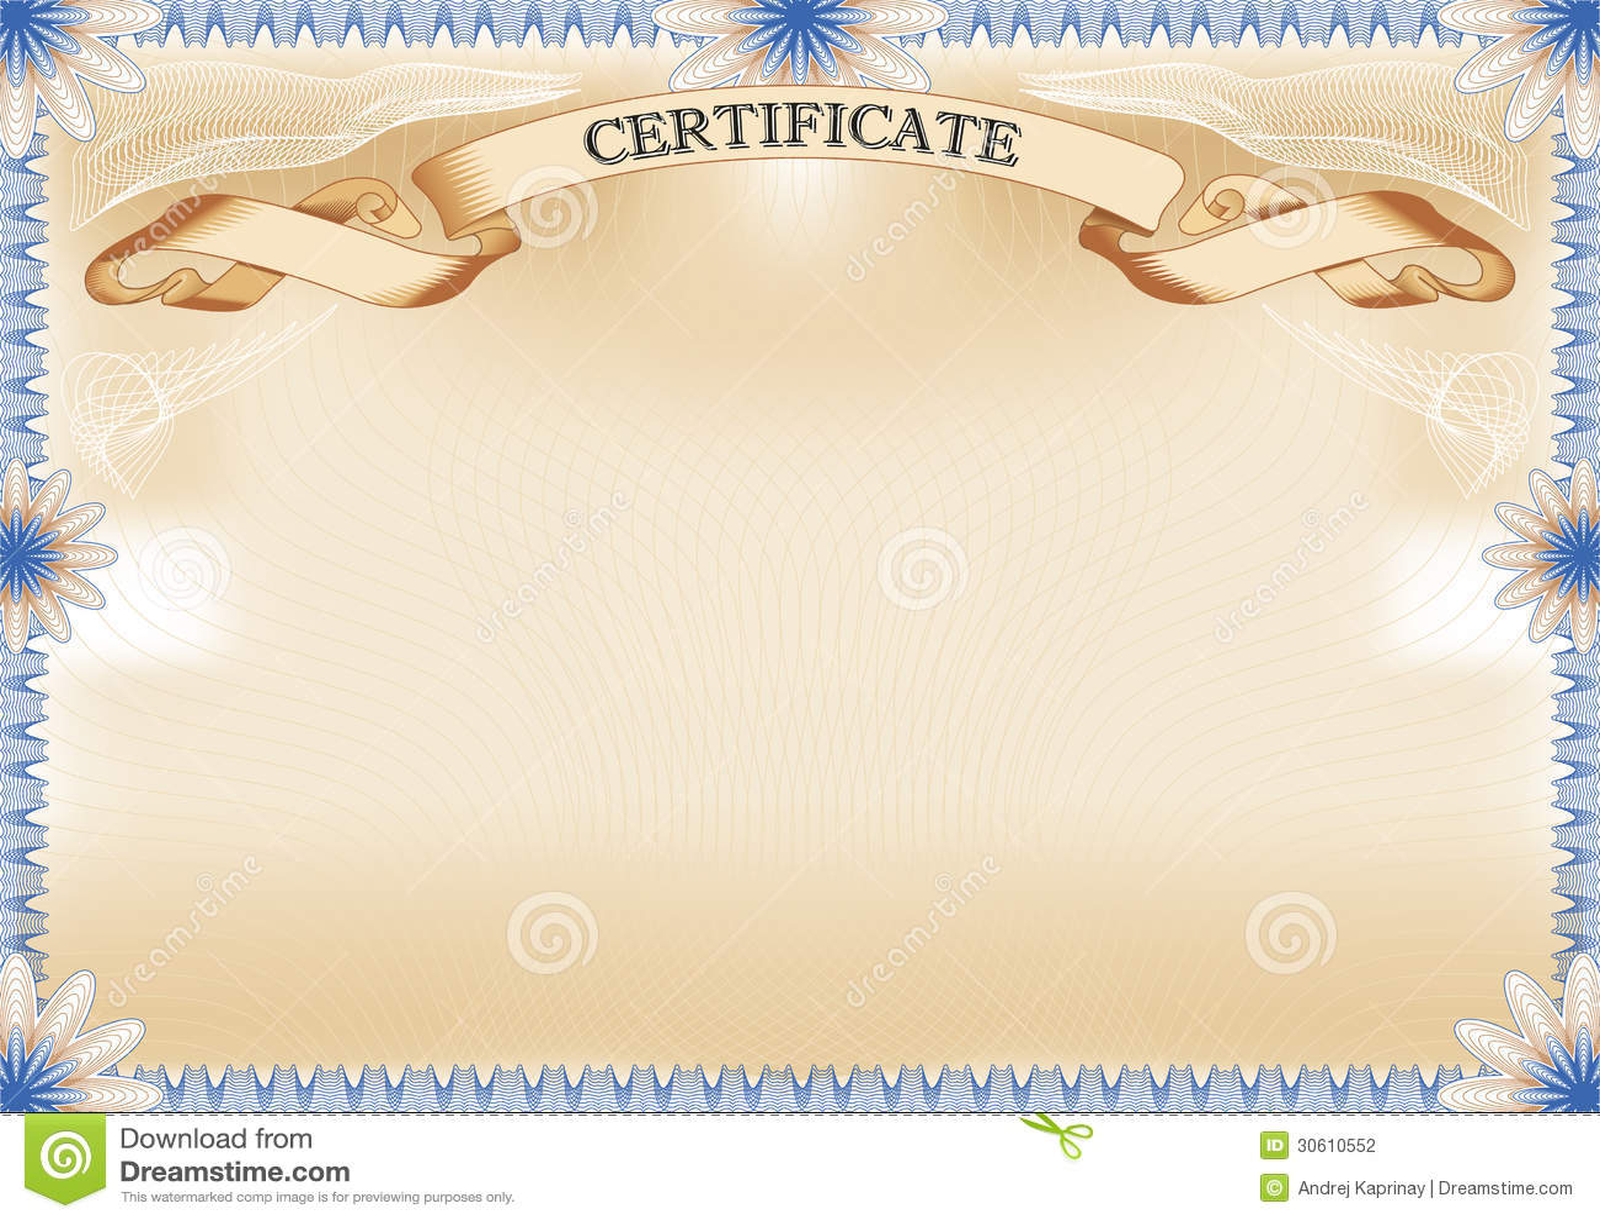 Certificate Template Stock Vector - Image: 46821834